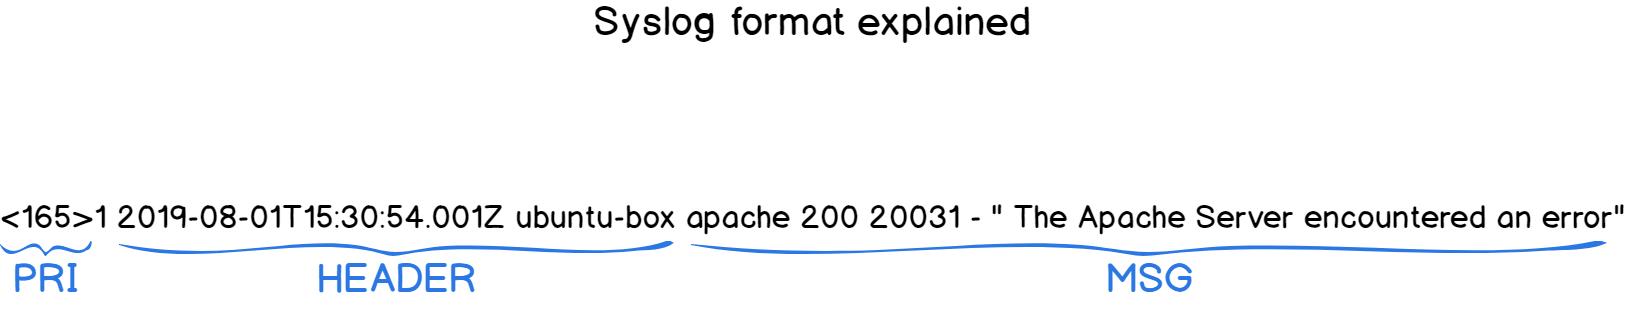 Syslog format explained